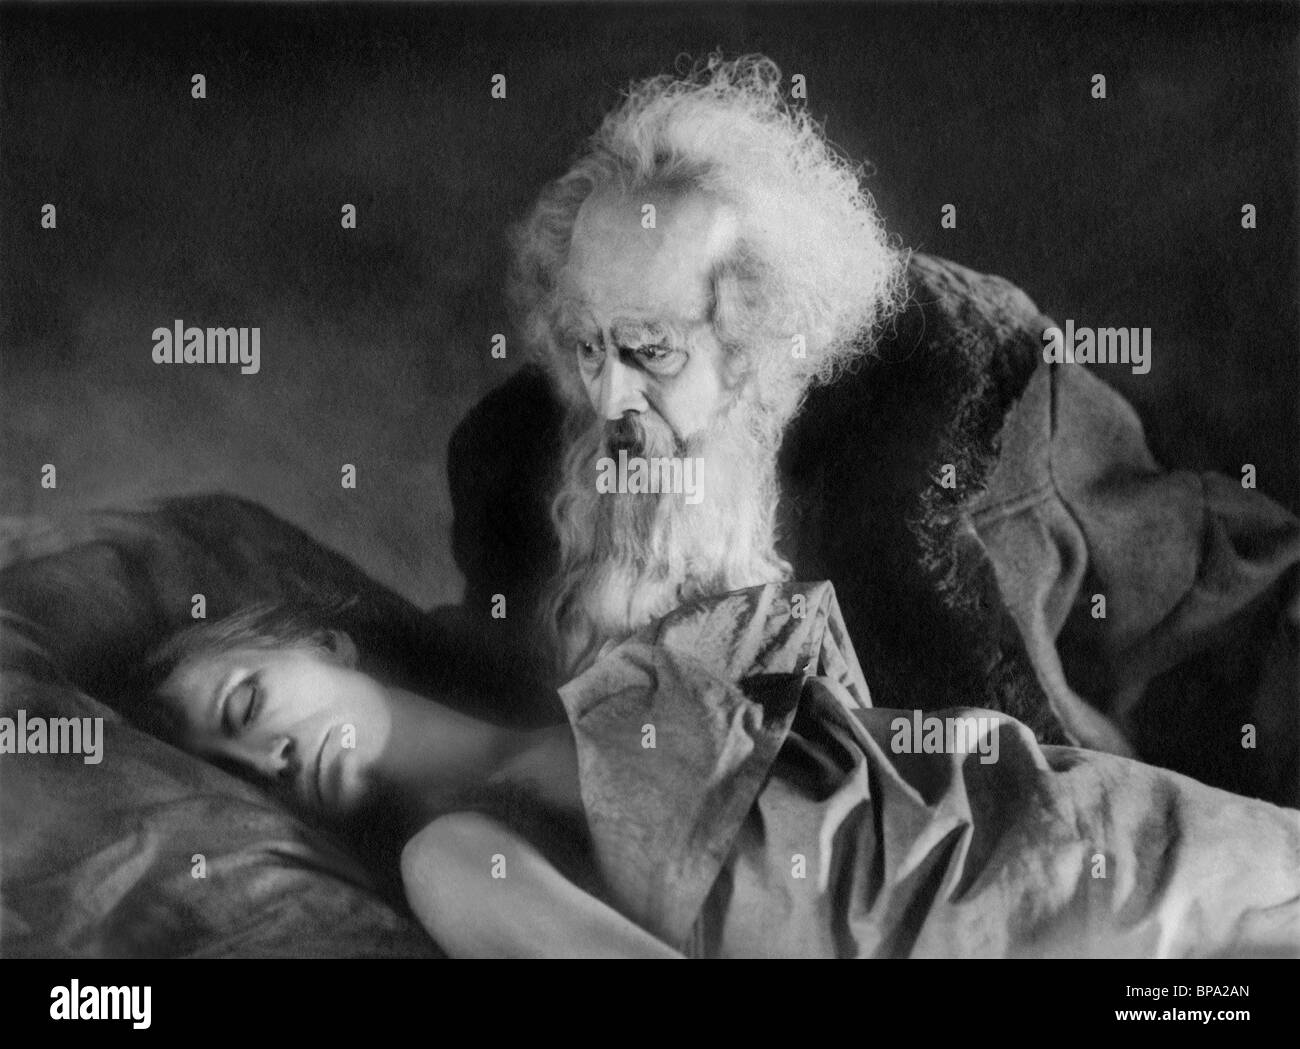 GOSTA EKMAN FAUST: A GERMAN FOLK LEGEND (1926) - Stock Image